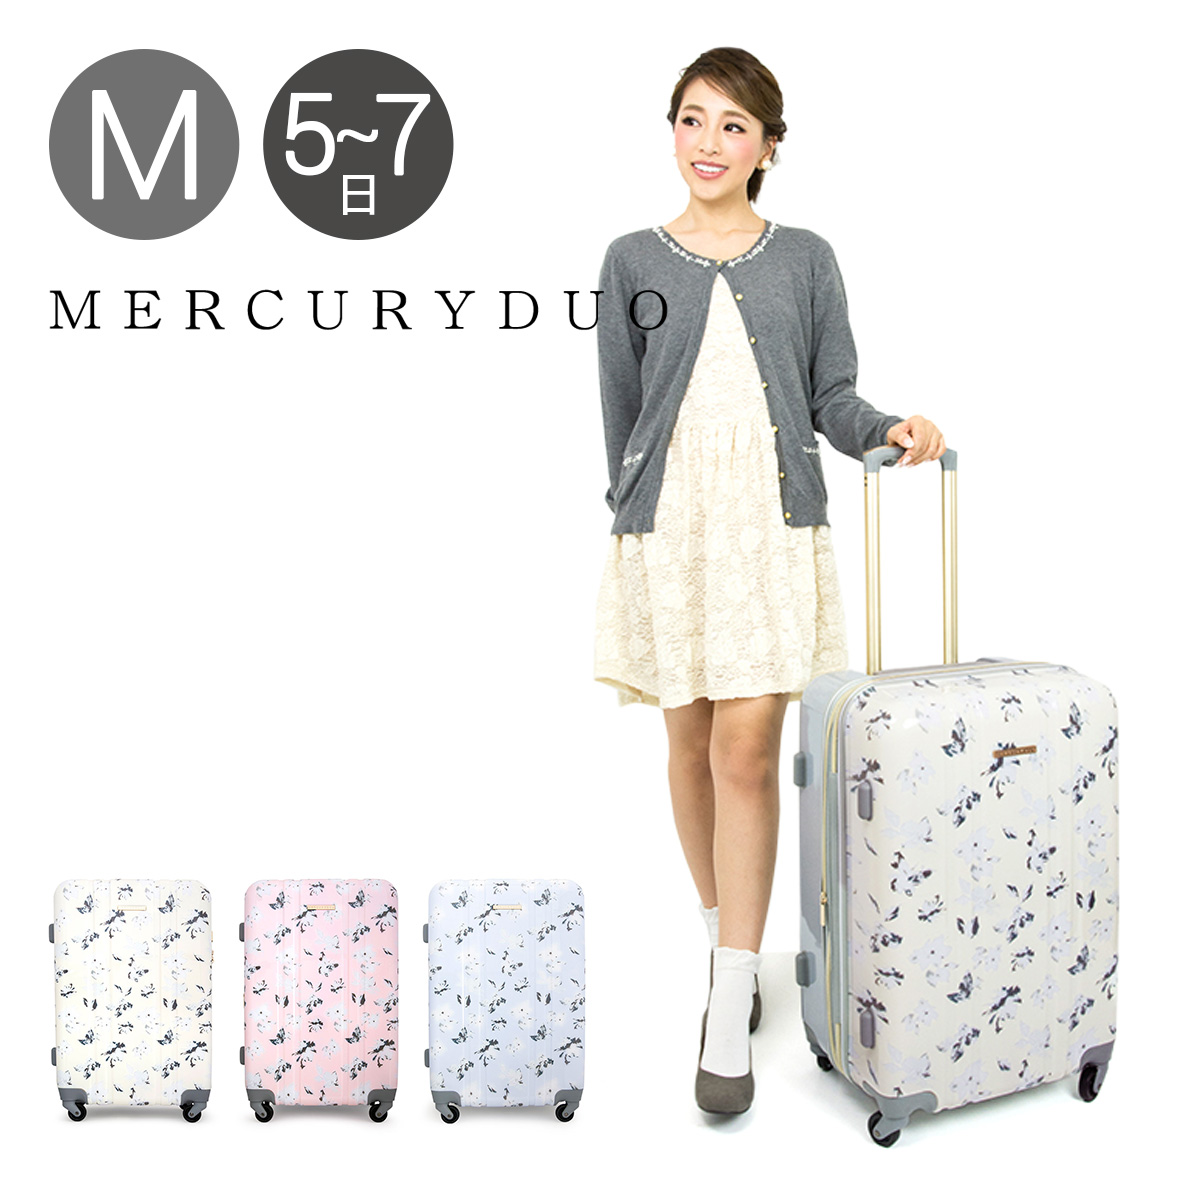 Mercury duo MERCURYDUO carry case MD-0717-61 61 cm